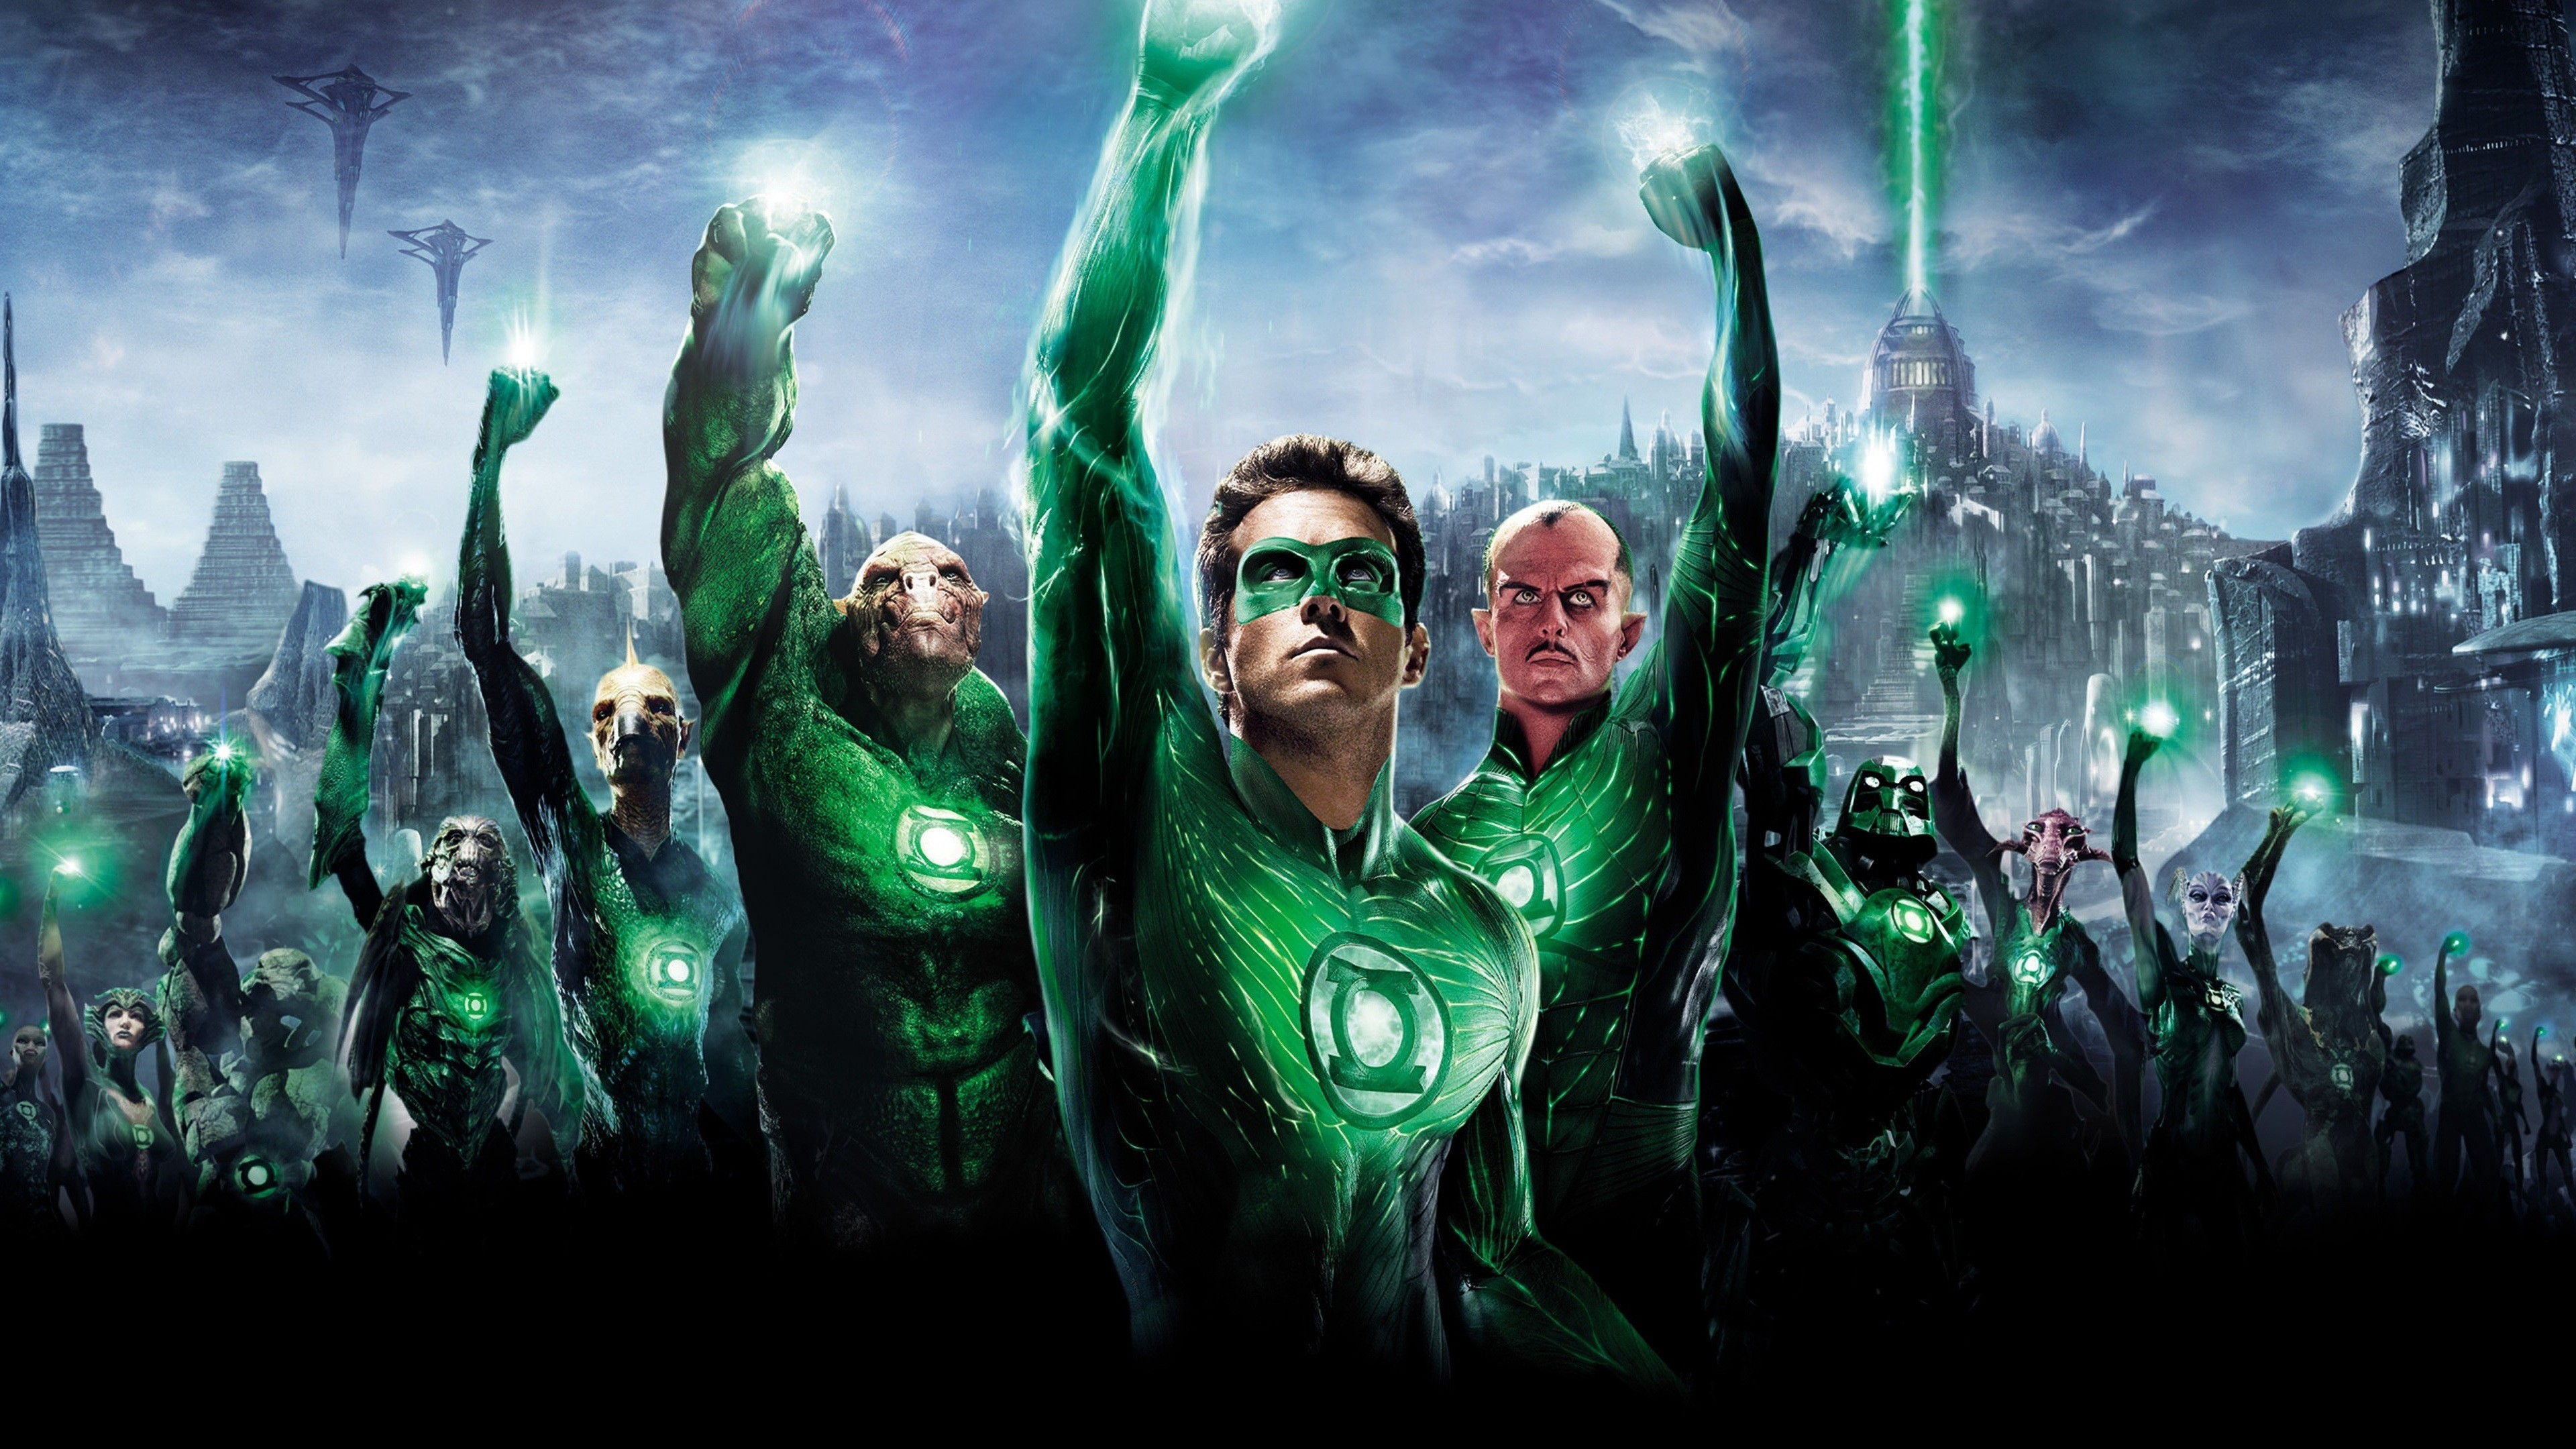 green lantern ryan 4k 1556184976 - Green Lantern Ryan 4k - superheroes wallpapers, hd-wallpapers, green lantern wallpapers, digital art wallpapers, artwork wallpapers